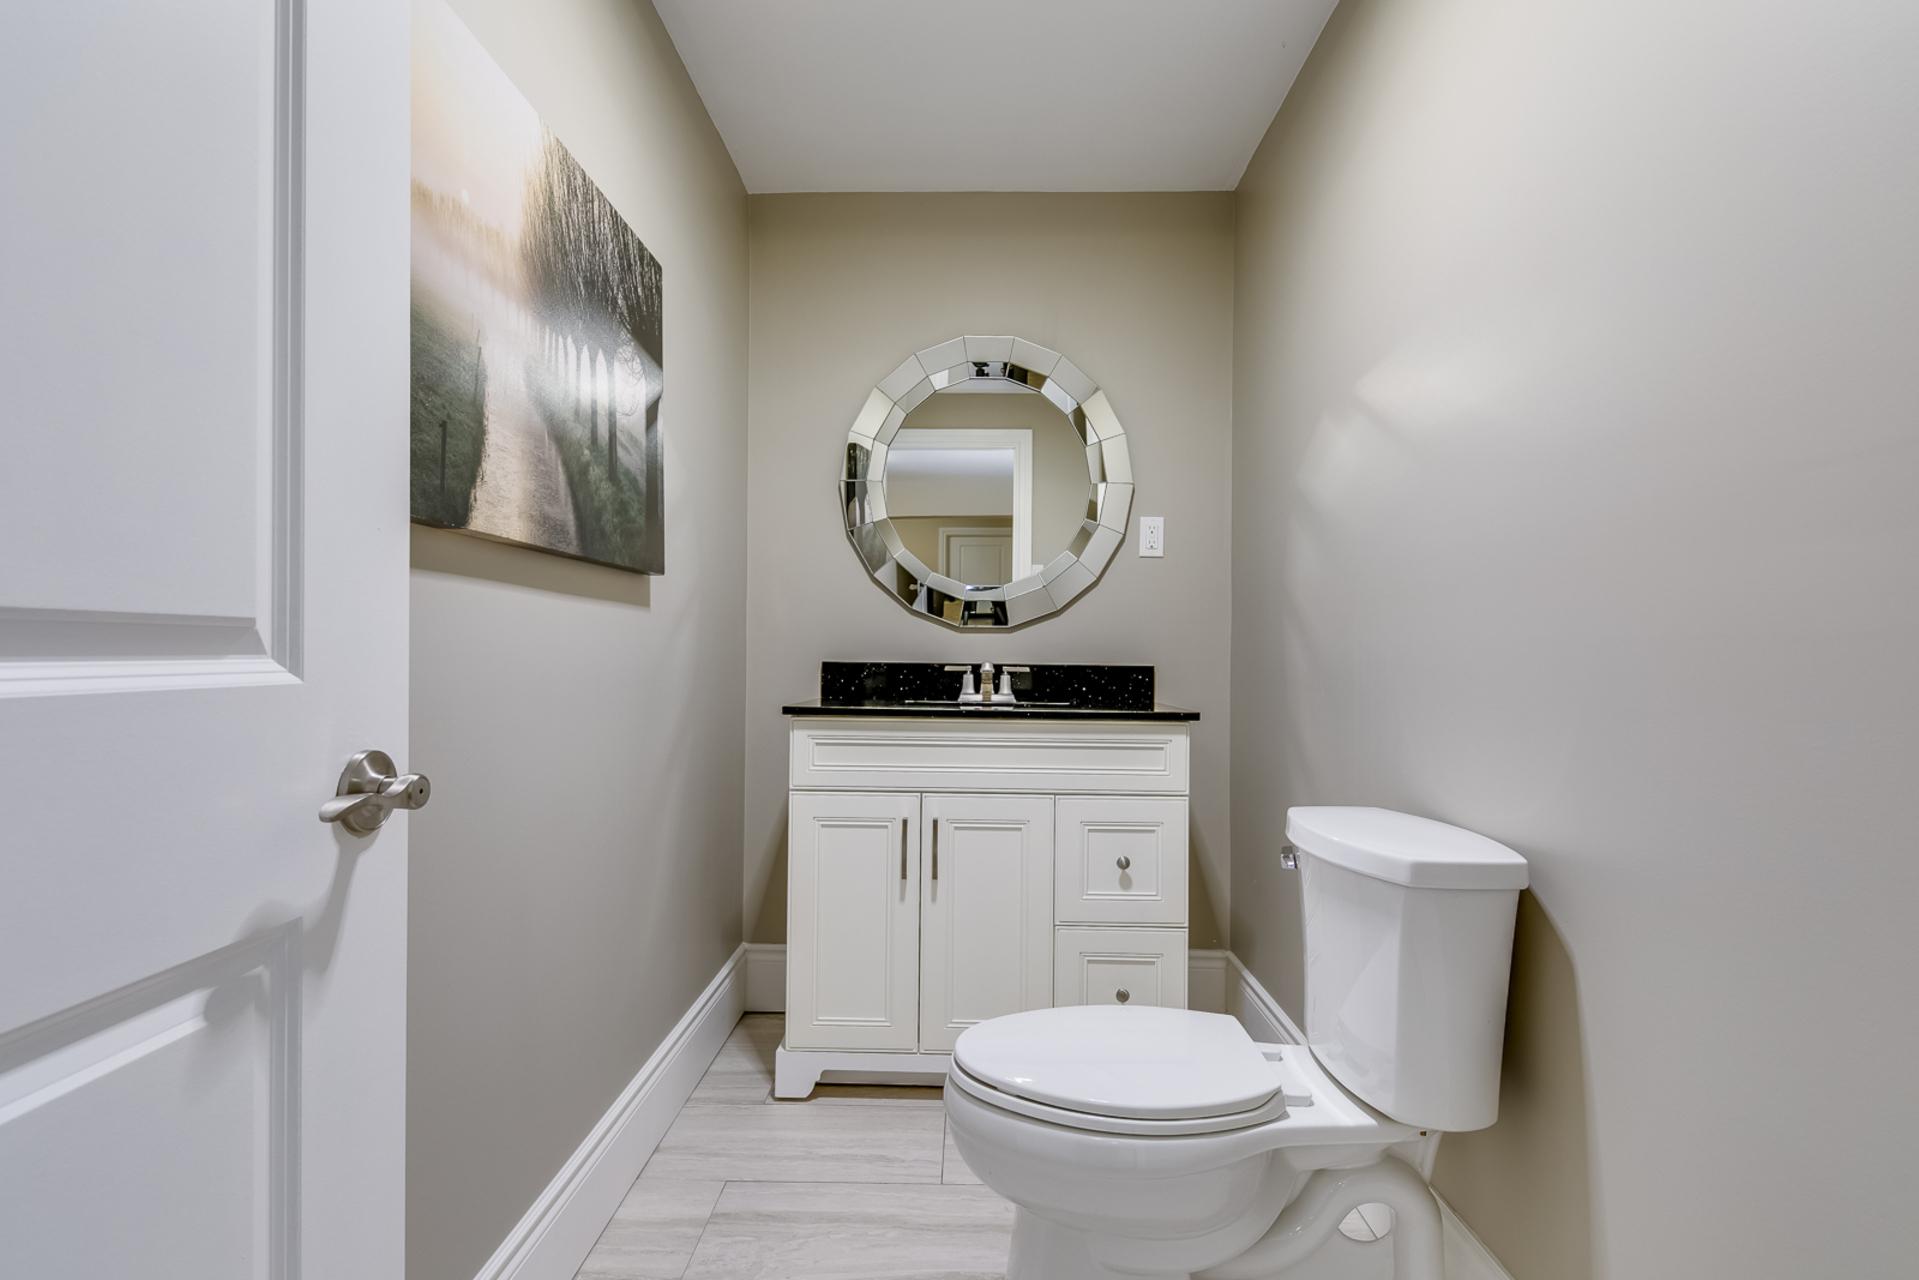 Basement Bathroom - 5041 Lakeshore Rd, Burlington - Elite3 & Team at 5041 Lakeshore Road, Appleby, Burlington